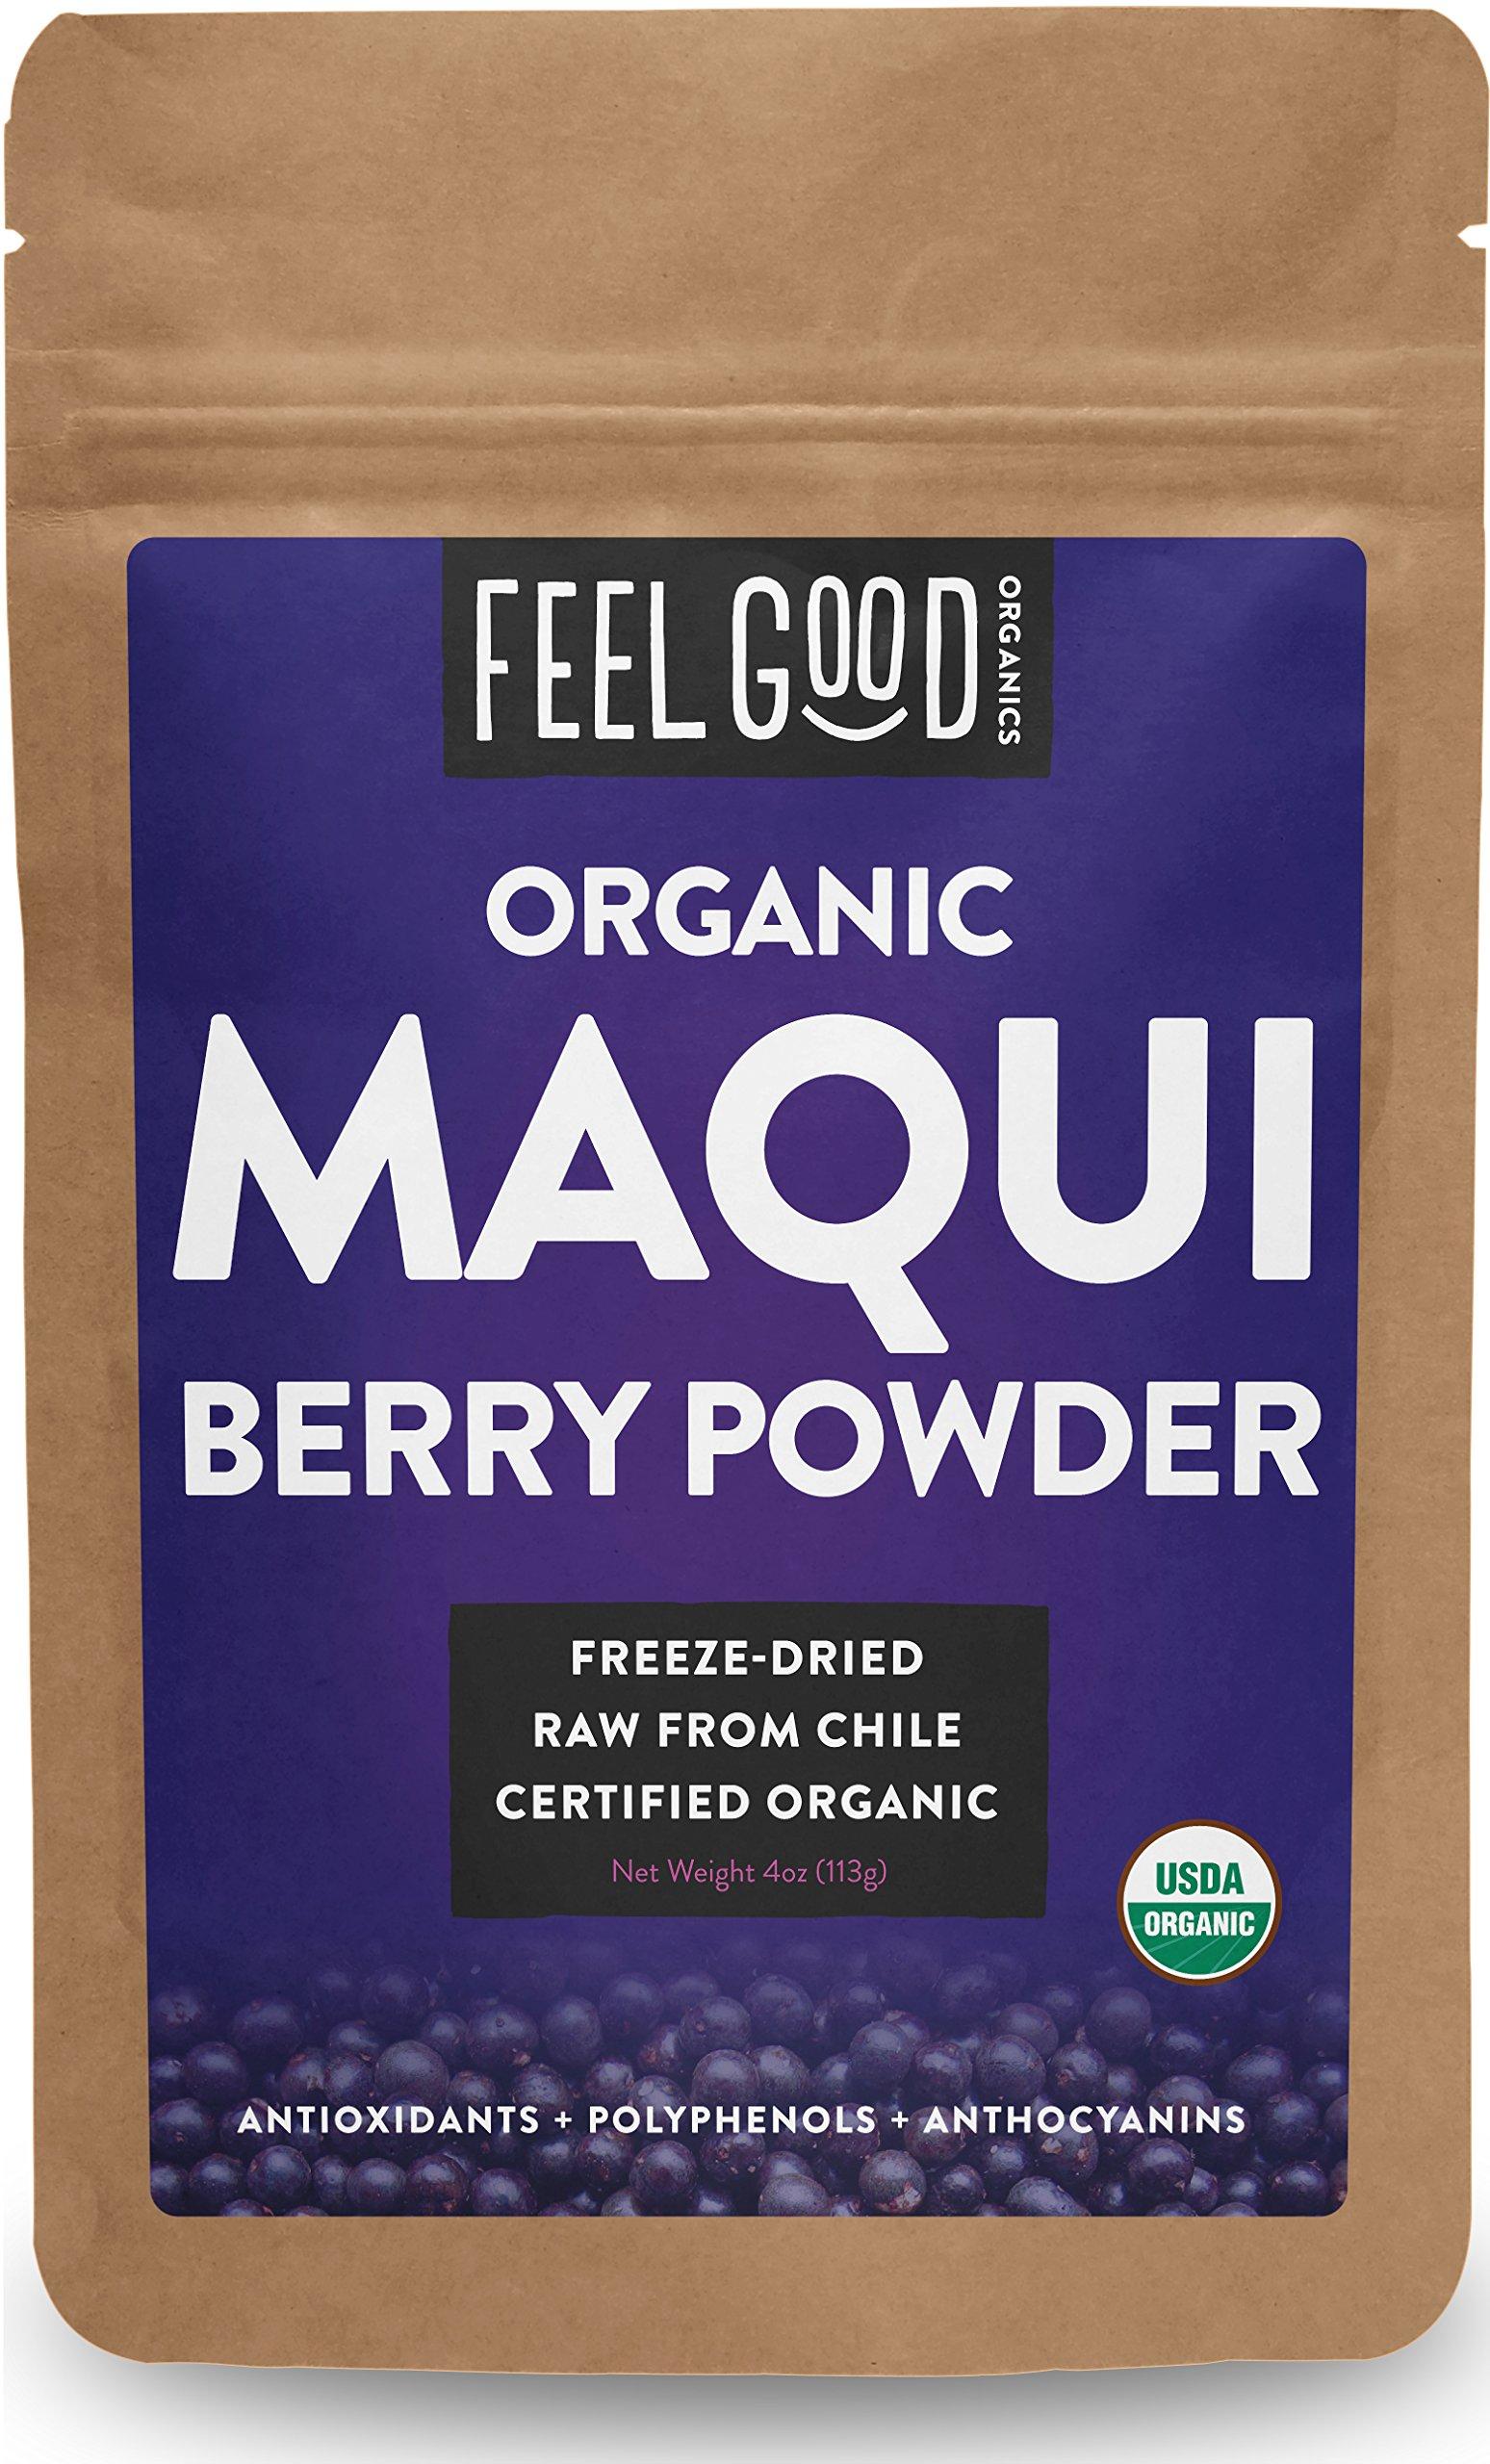 Organic Maqui Powder - 4oz Resealable Bag - 100% Raw From Chile - by Feel Good Organics